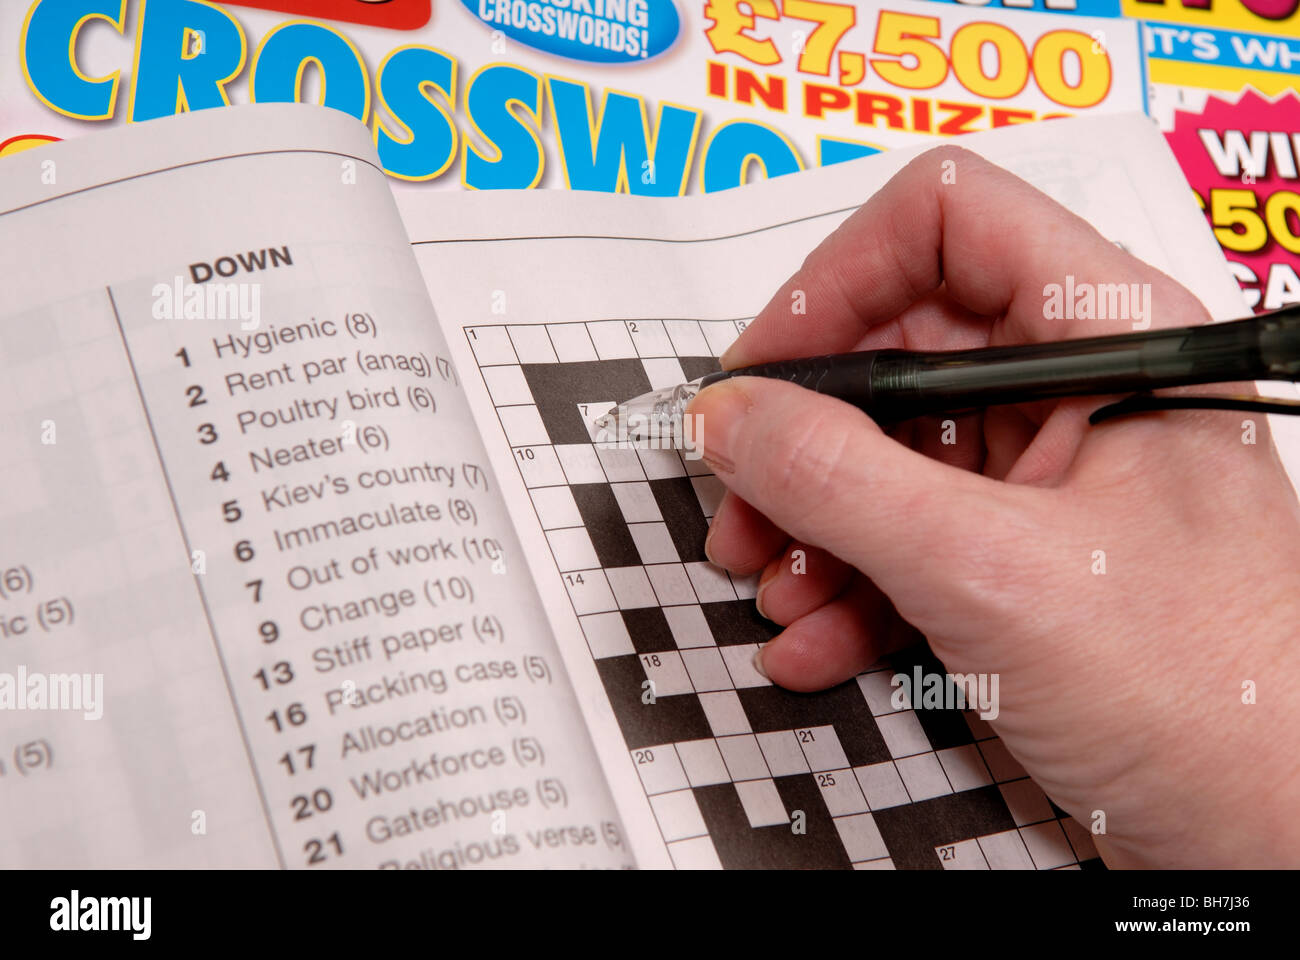 Crossword Puzzle Book.   Stock Image